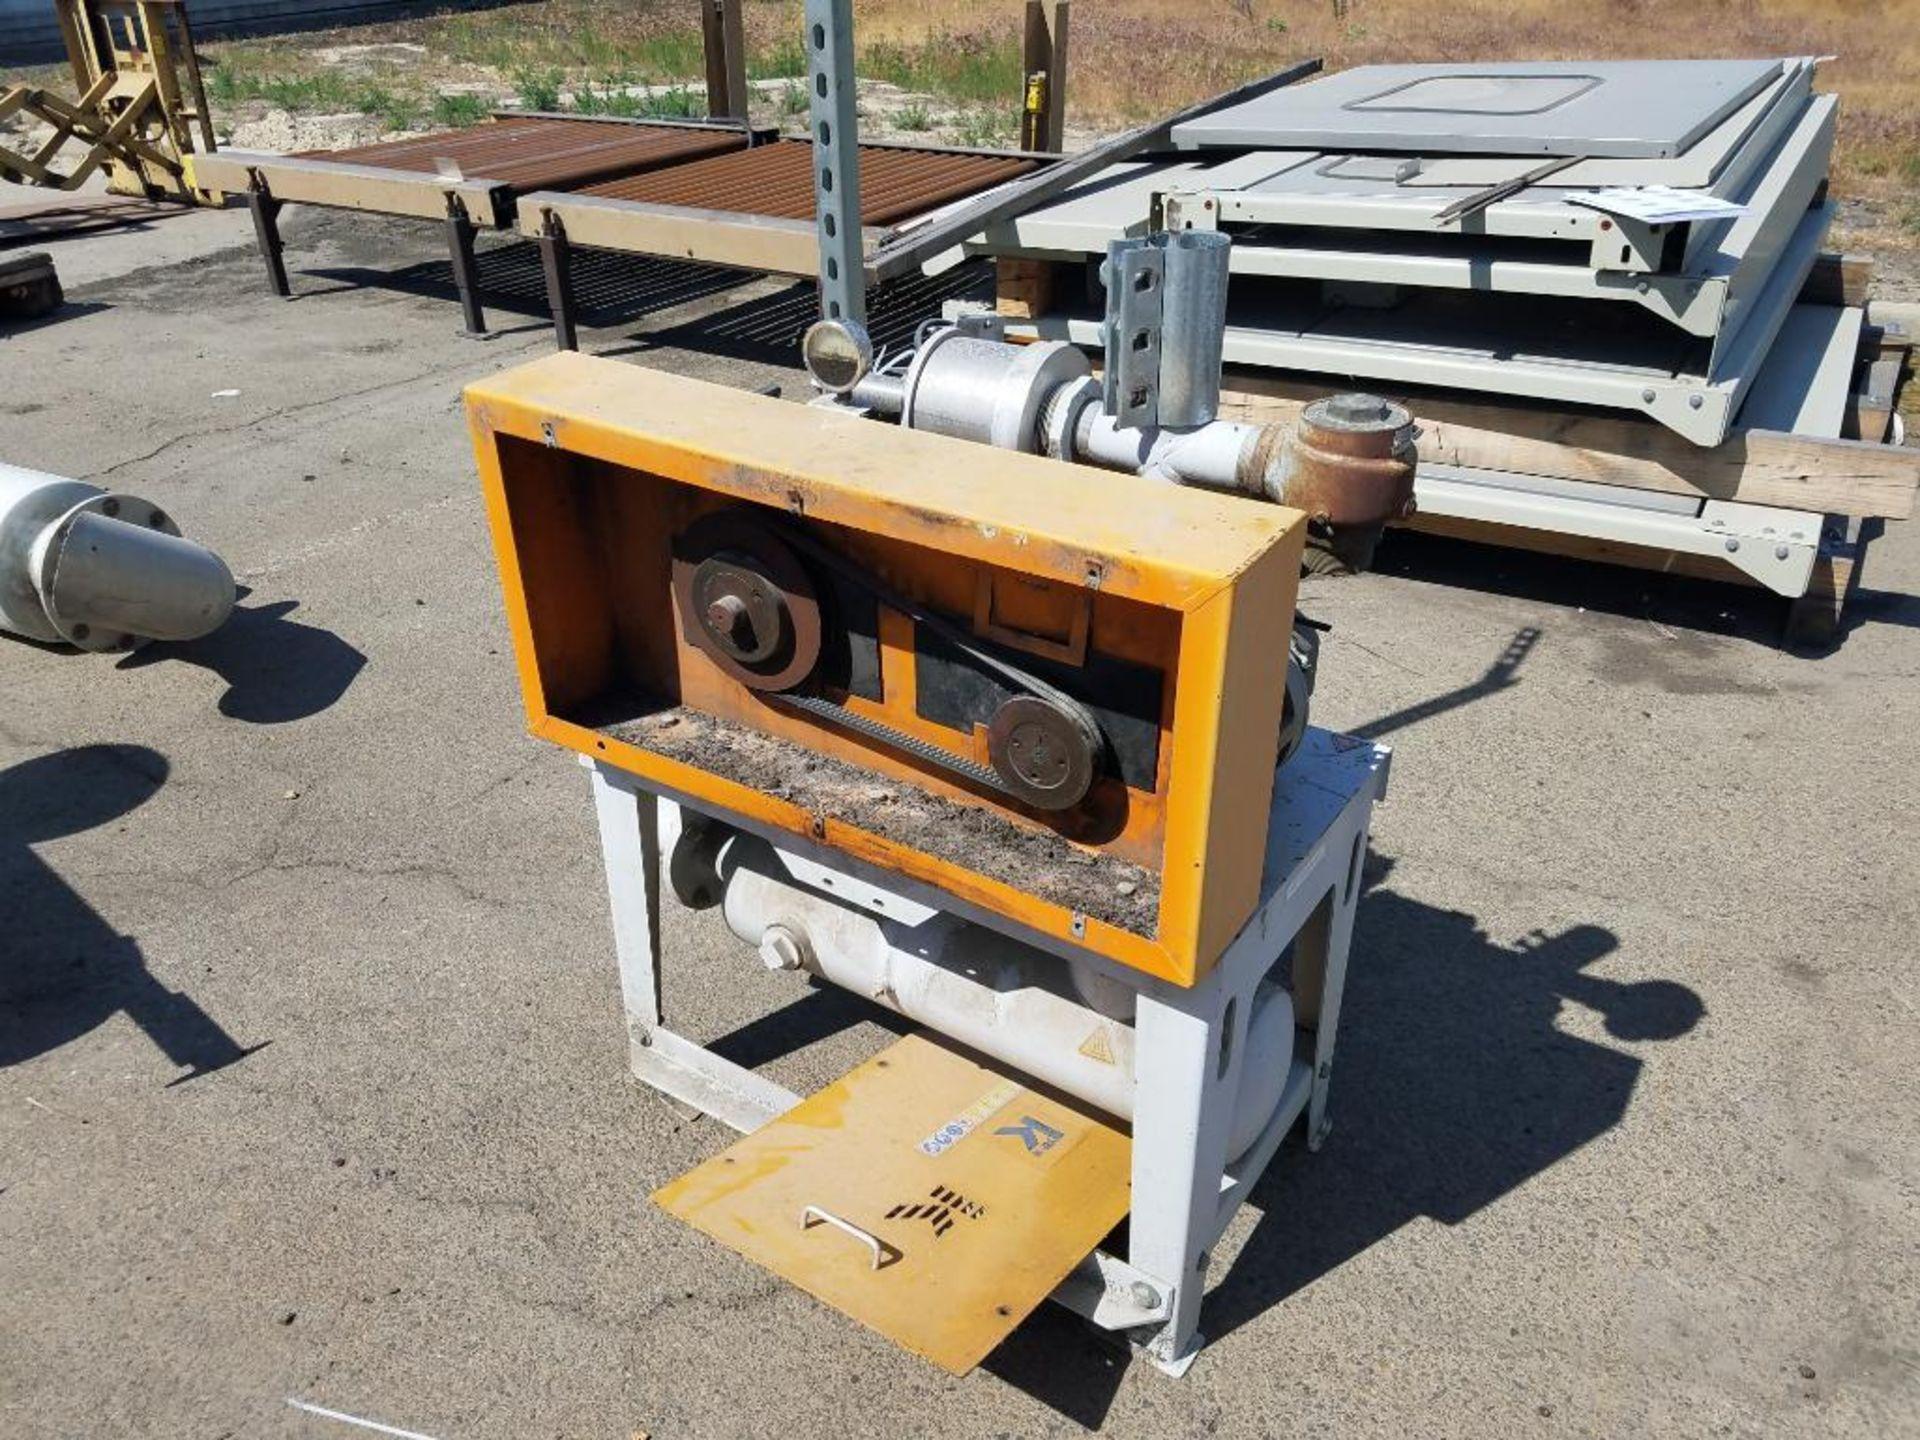 Sutorbilt rotary positive blower - Image 2 of 5